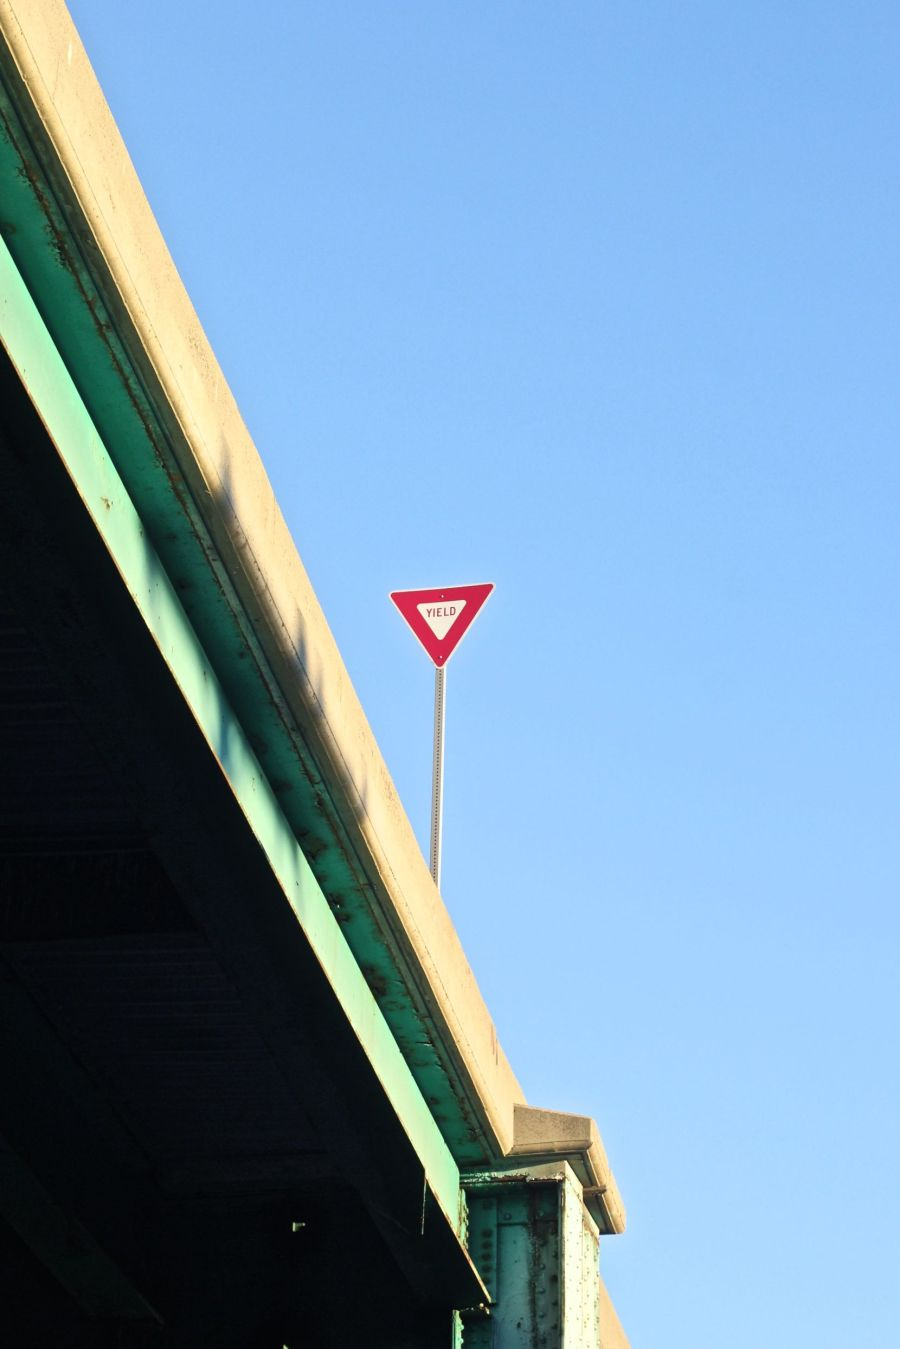 boston dorchester yield sign